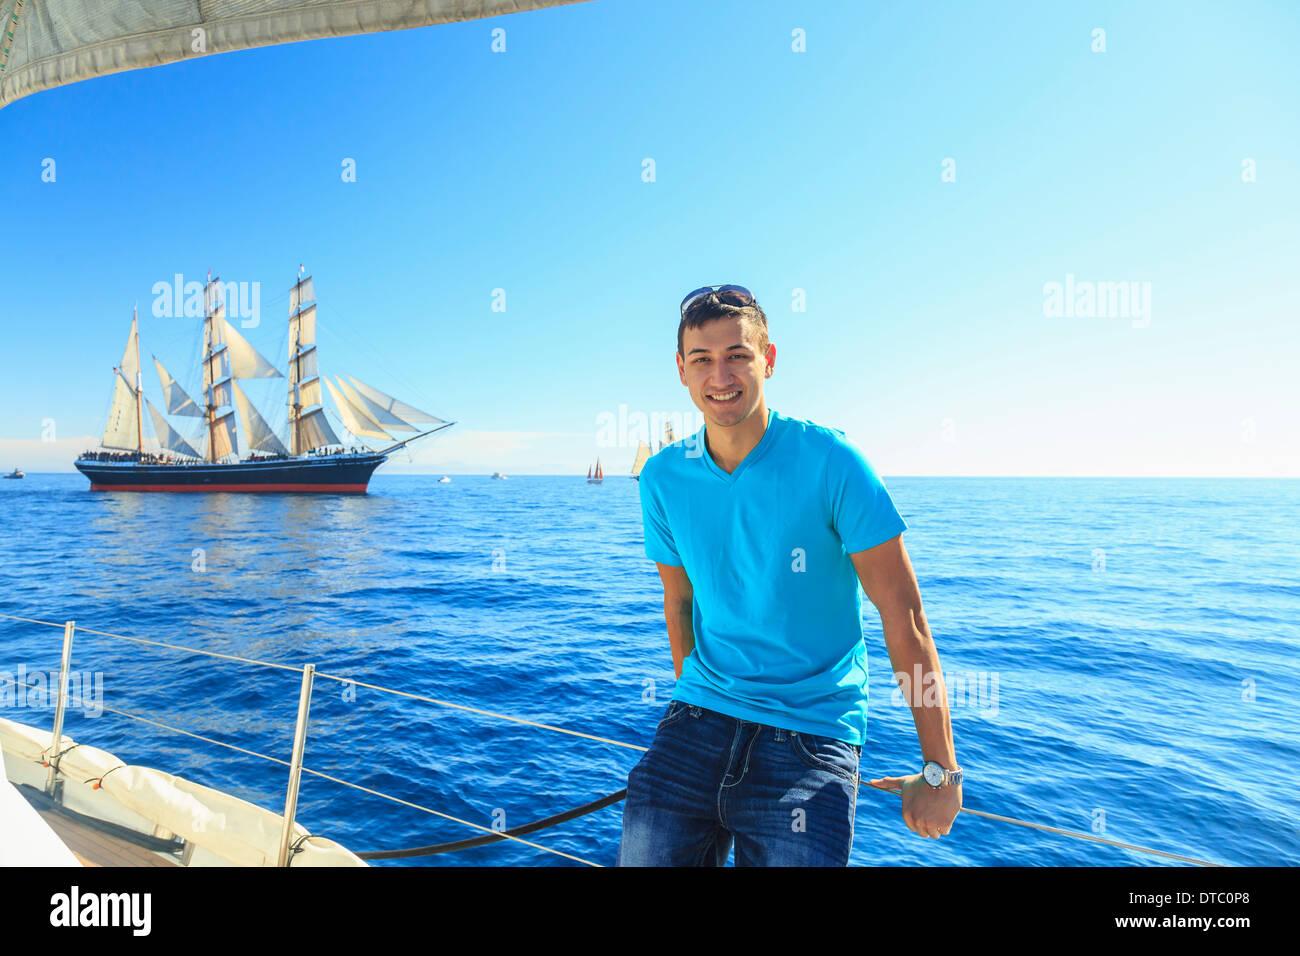 Jeune homme, à San Diego, Californie, USA Photo Stock